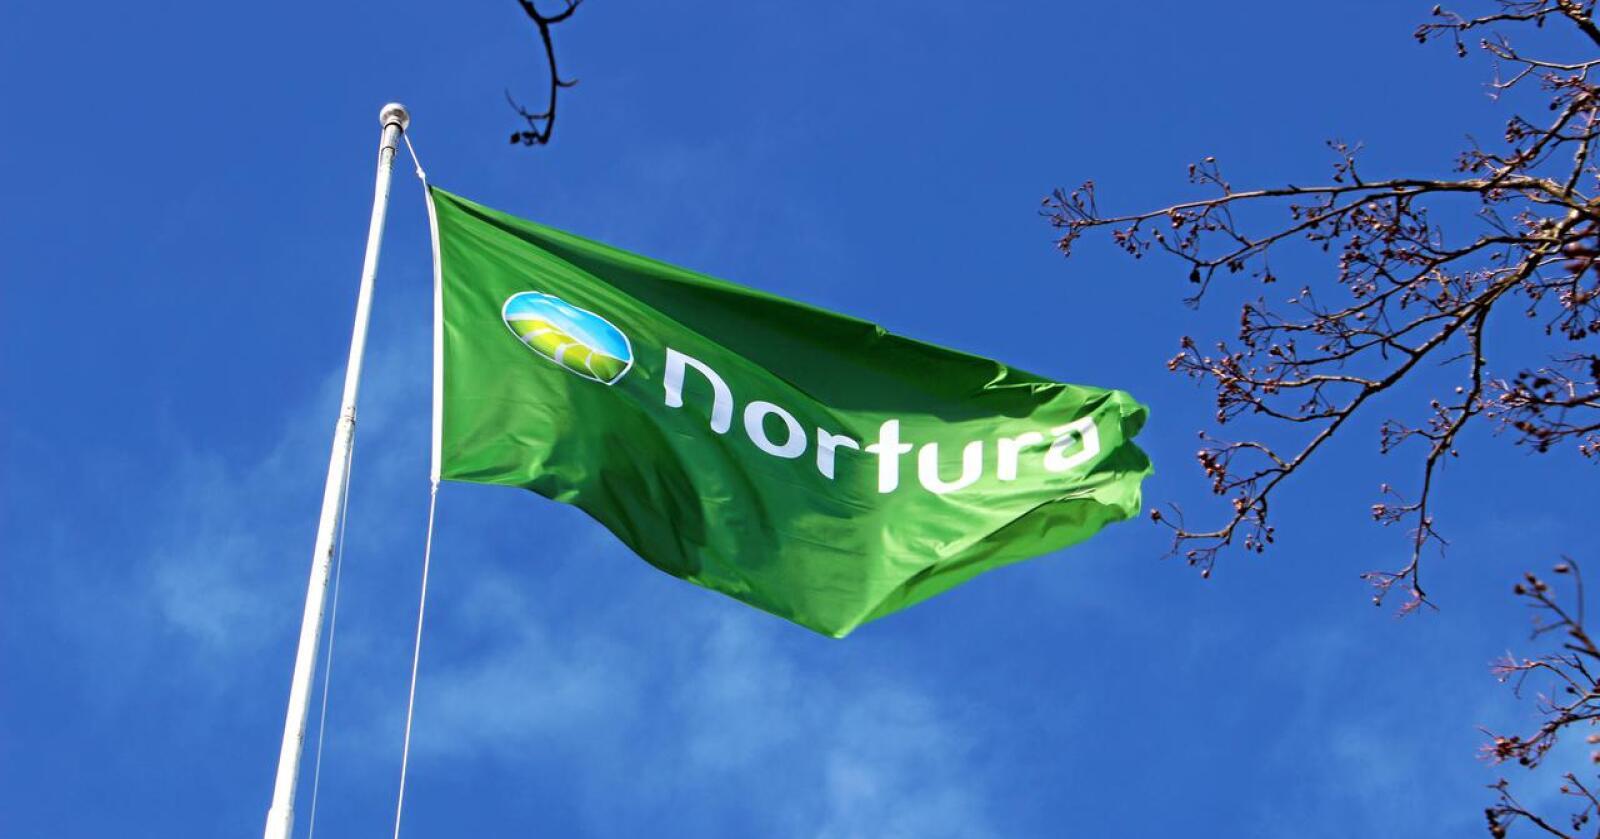 Driftsinntektene til Norturas datterselskap Noridane Foods AS har økt kraftig under pandemien. Illustrasjonsfoto: Jon-Fredrik Bækgaard Klausen